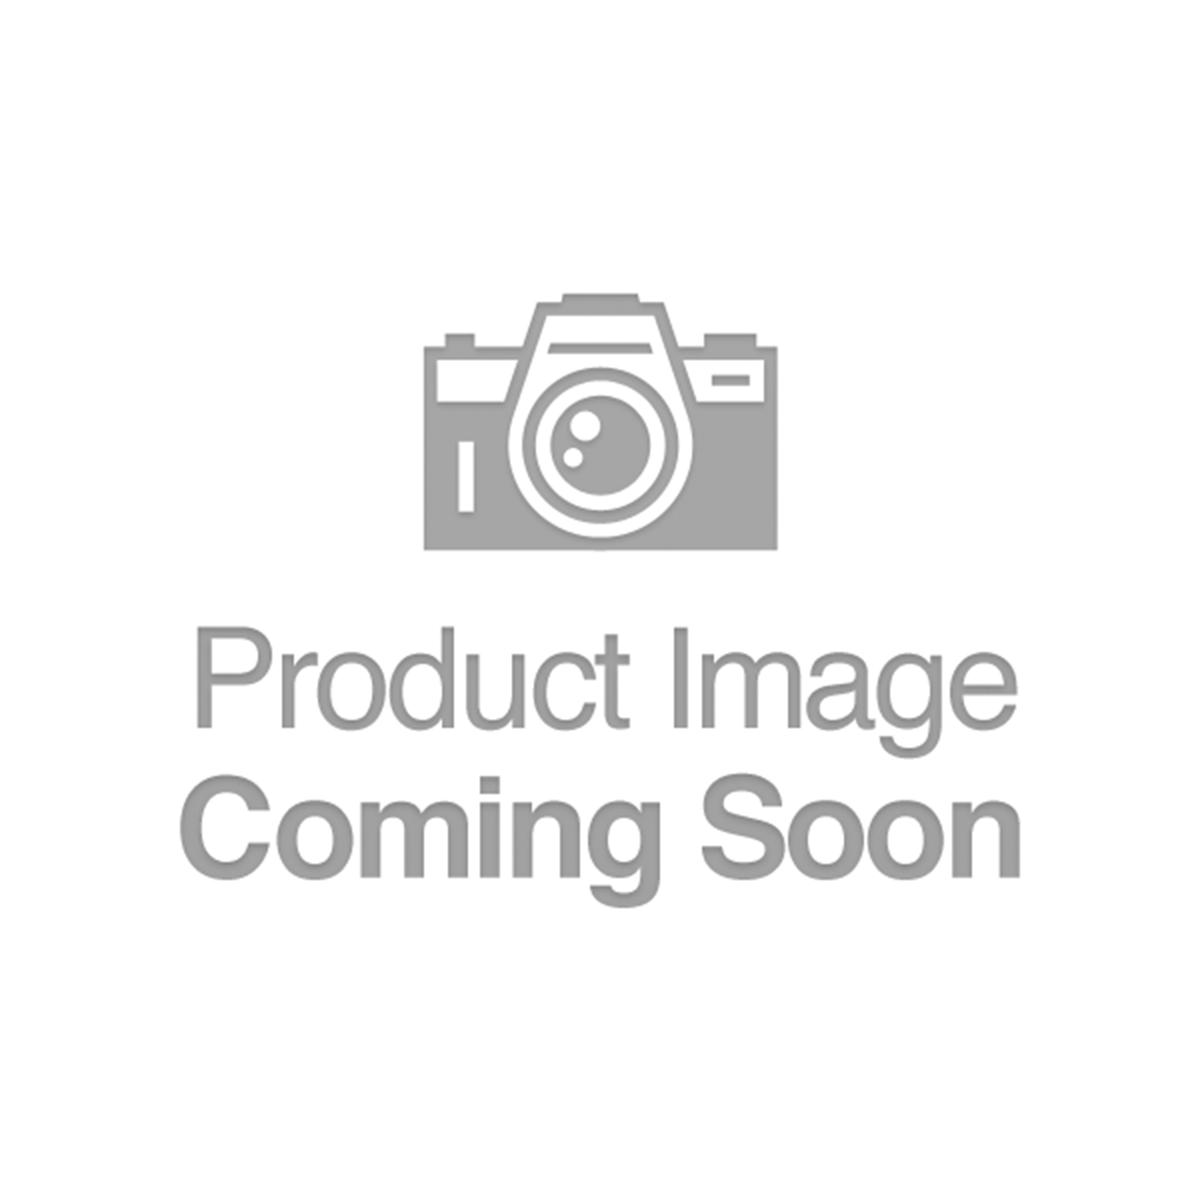 Adrian - Minnesota - CH 7960 - FR 599 - PMG 40 EPQ